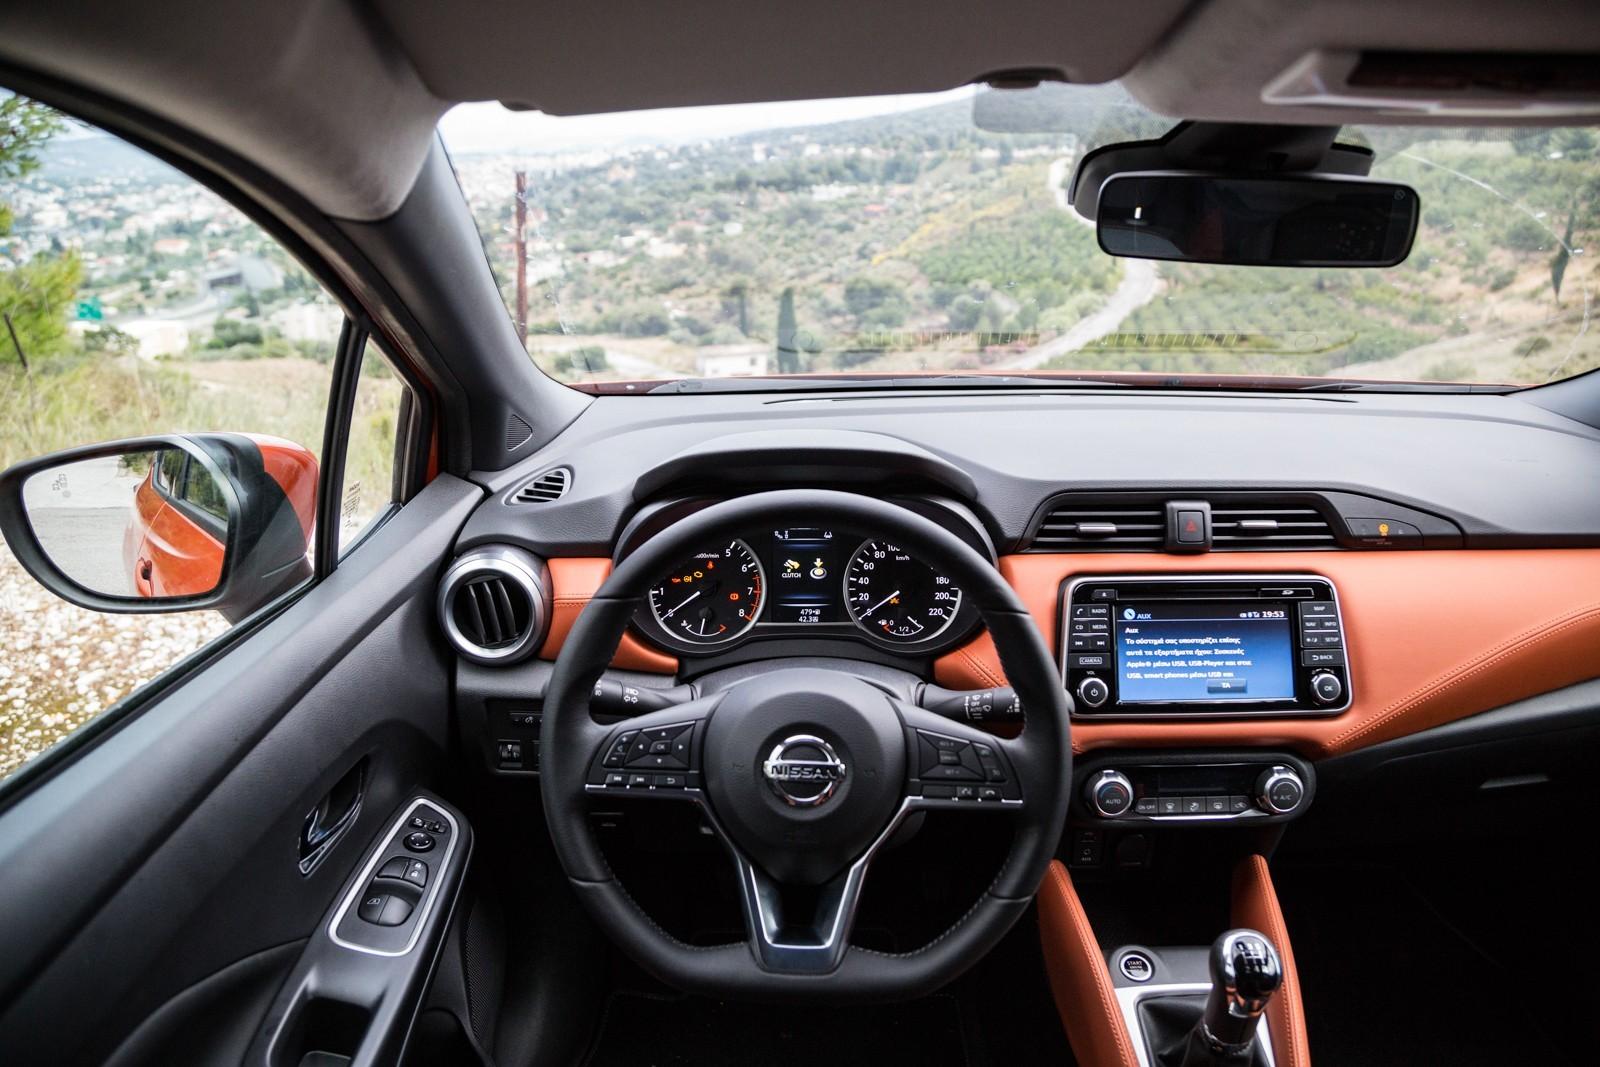 Test_Drive_Nissan_Micra_IG-T_90_41